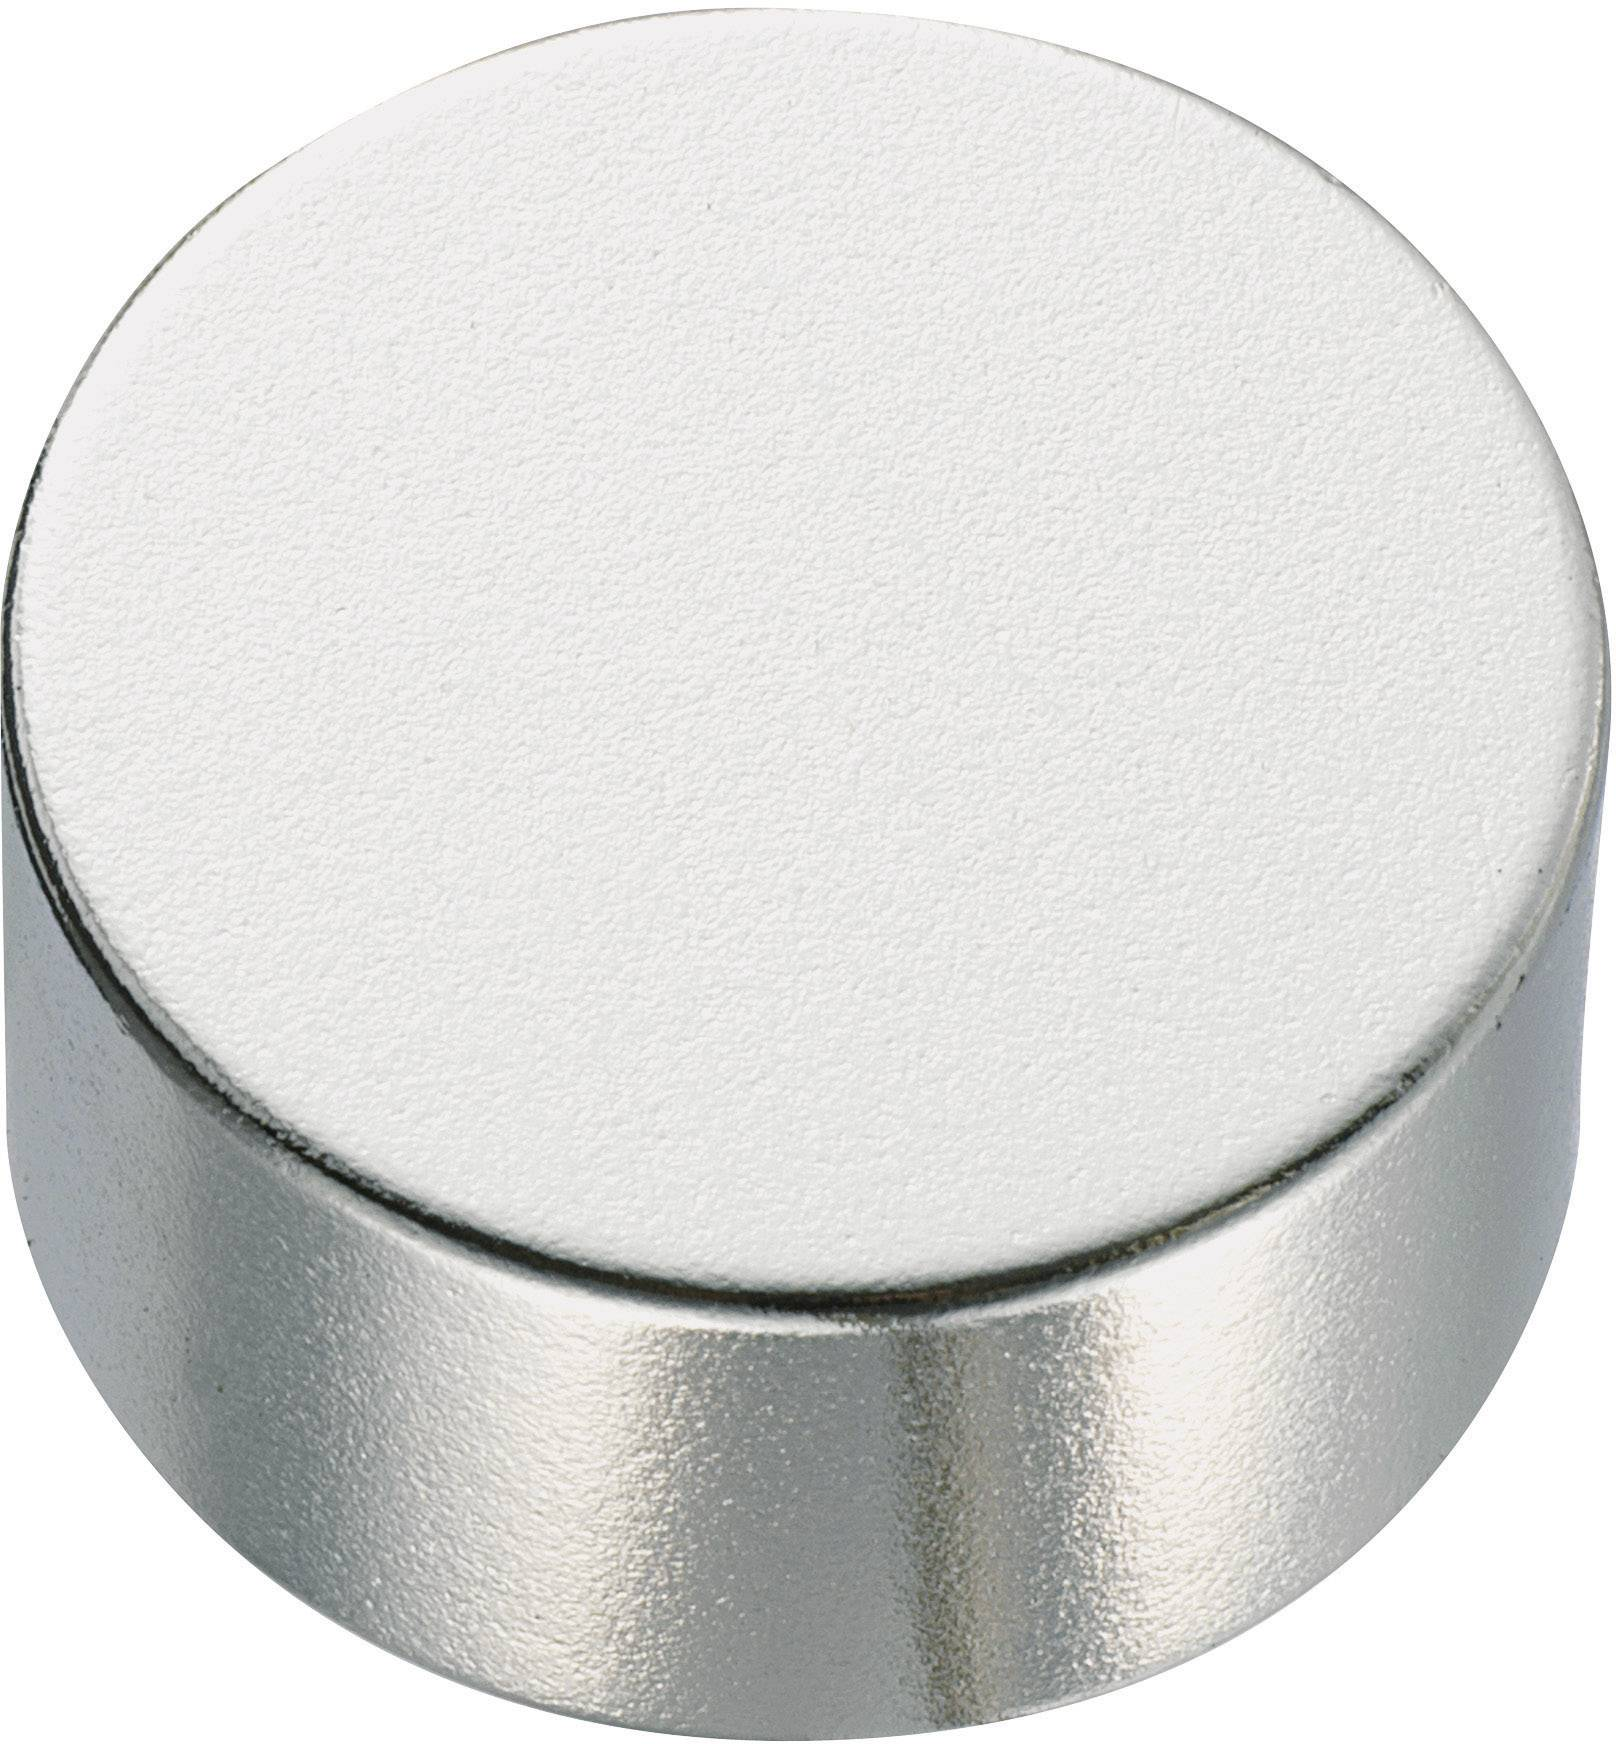 Permanentný magnet, N45, 20 x 10 mm, valcový